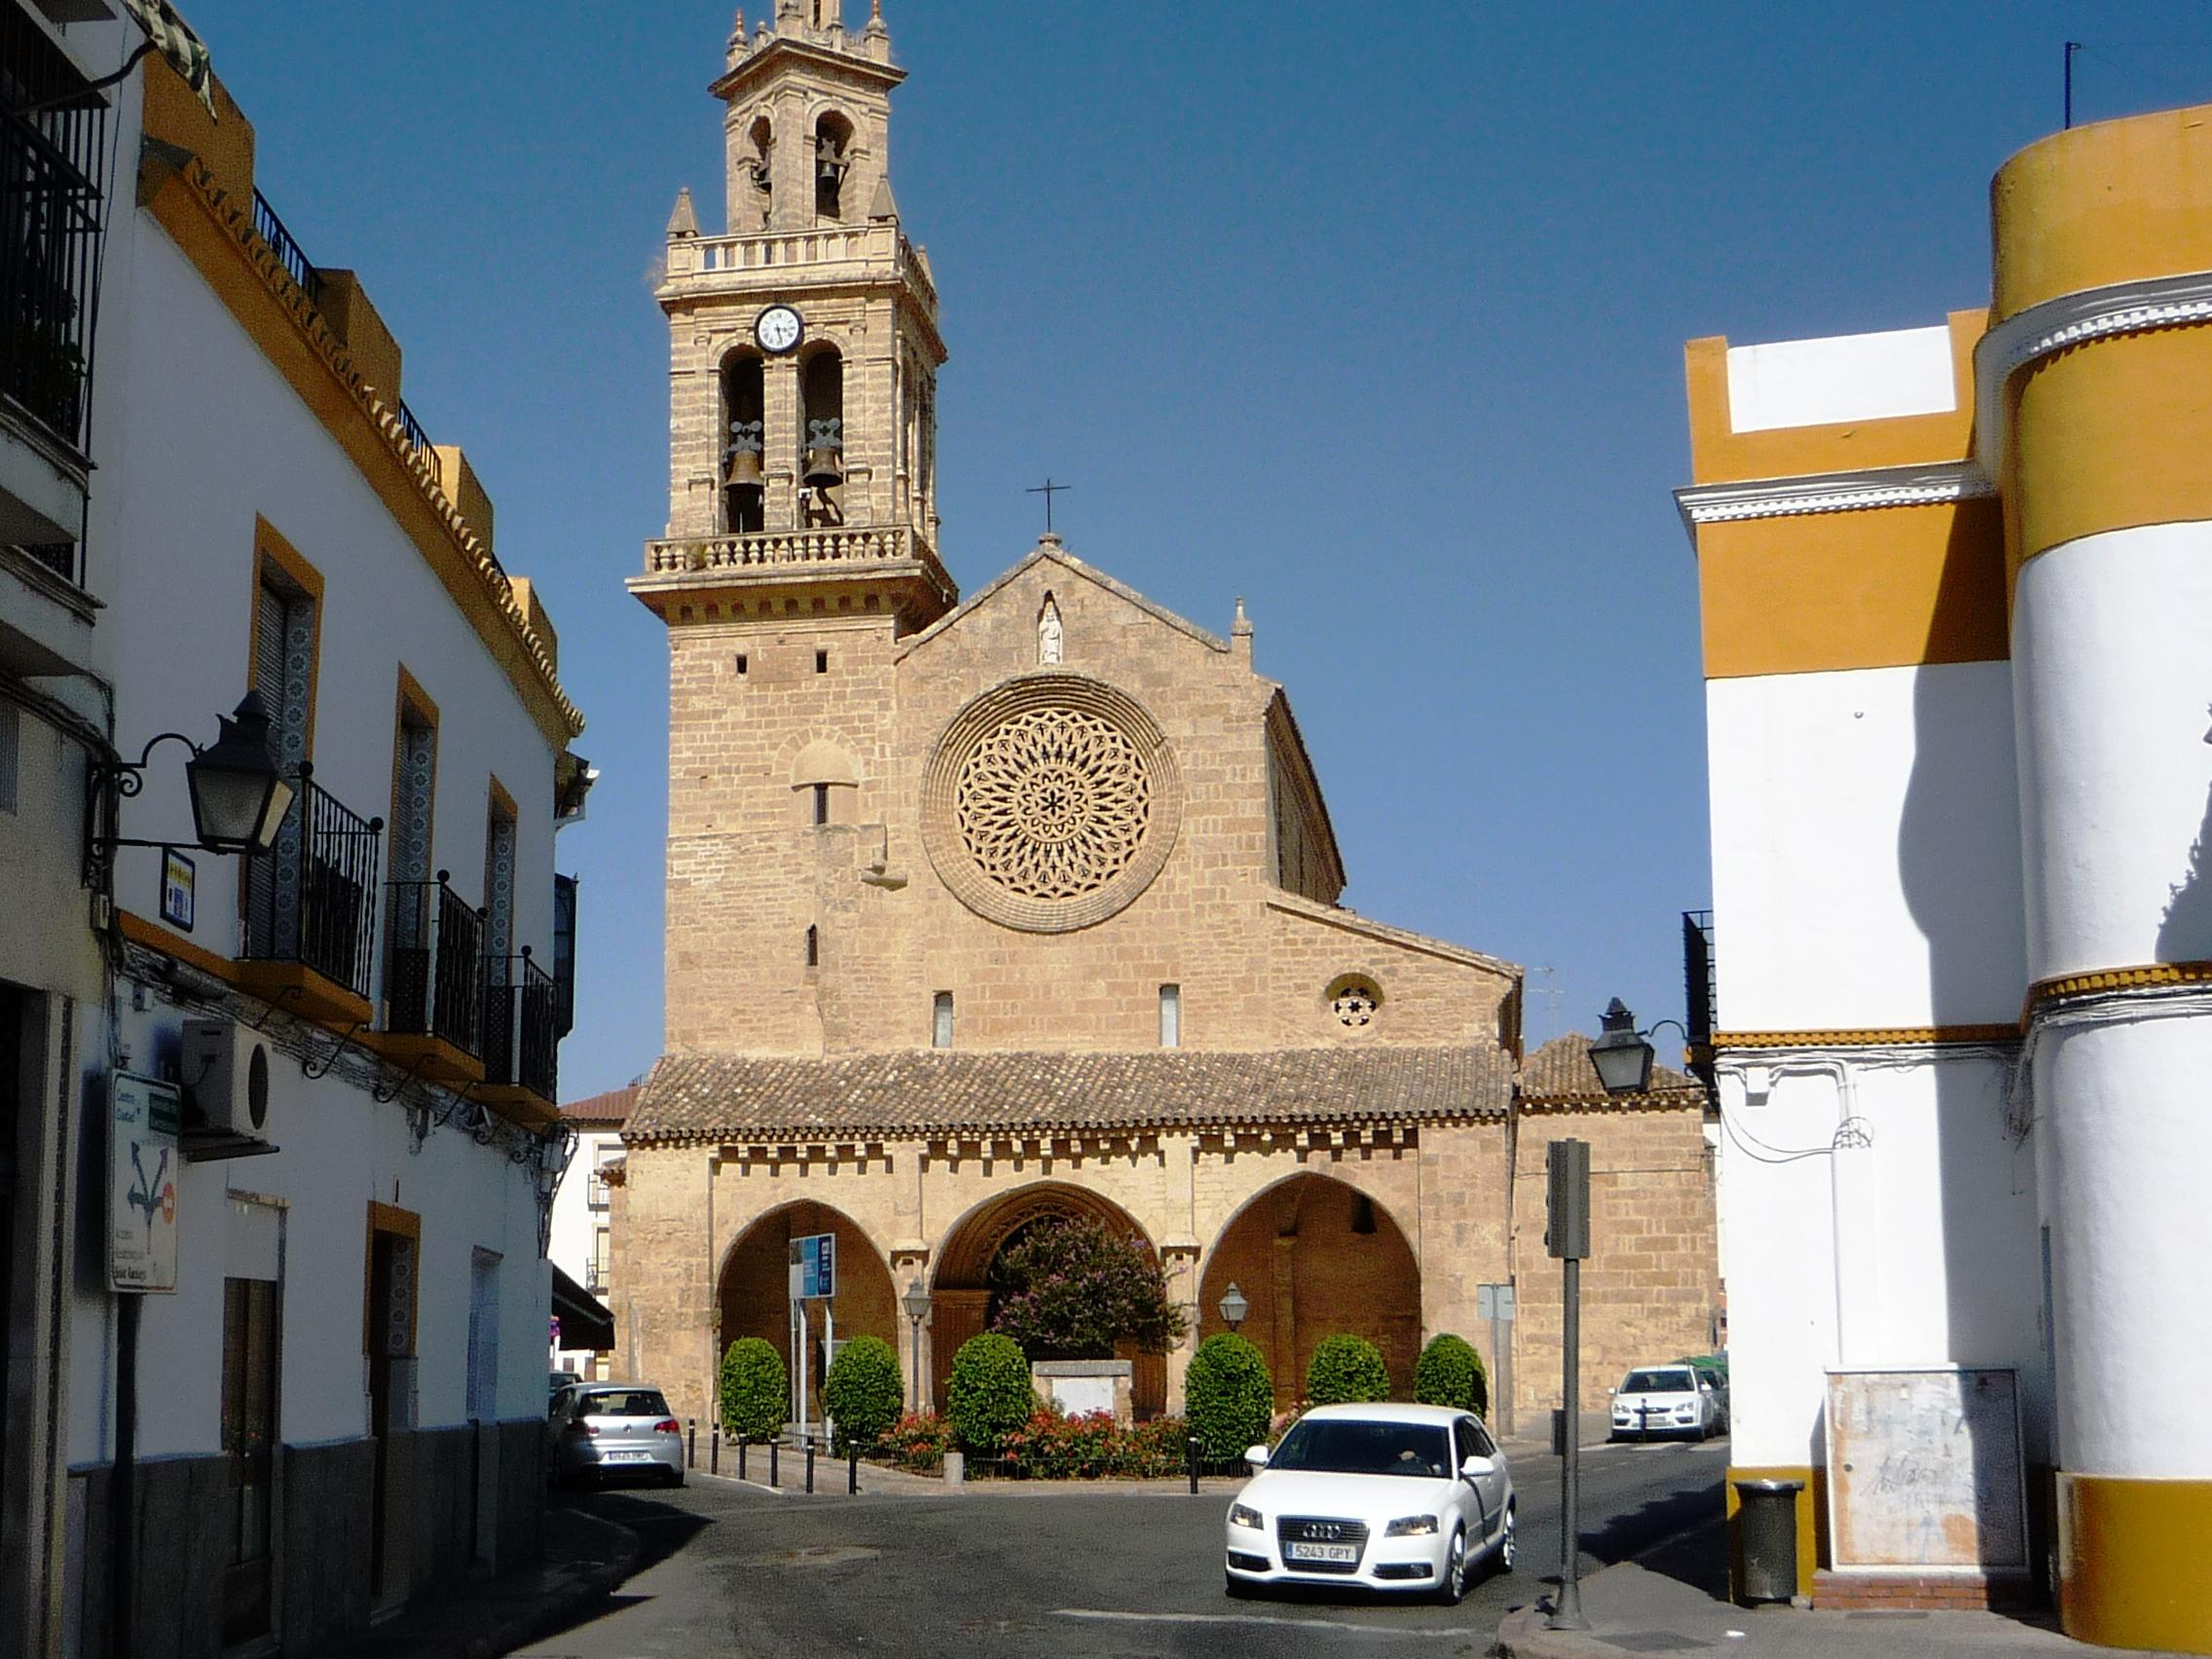 File:Iglesia de San Lorenzo - Córdoba (España).jpg - Wikimedia Commons